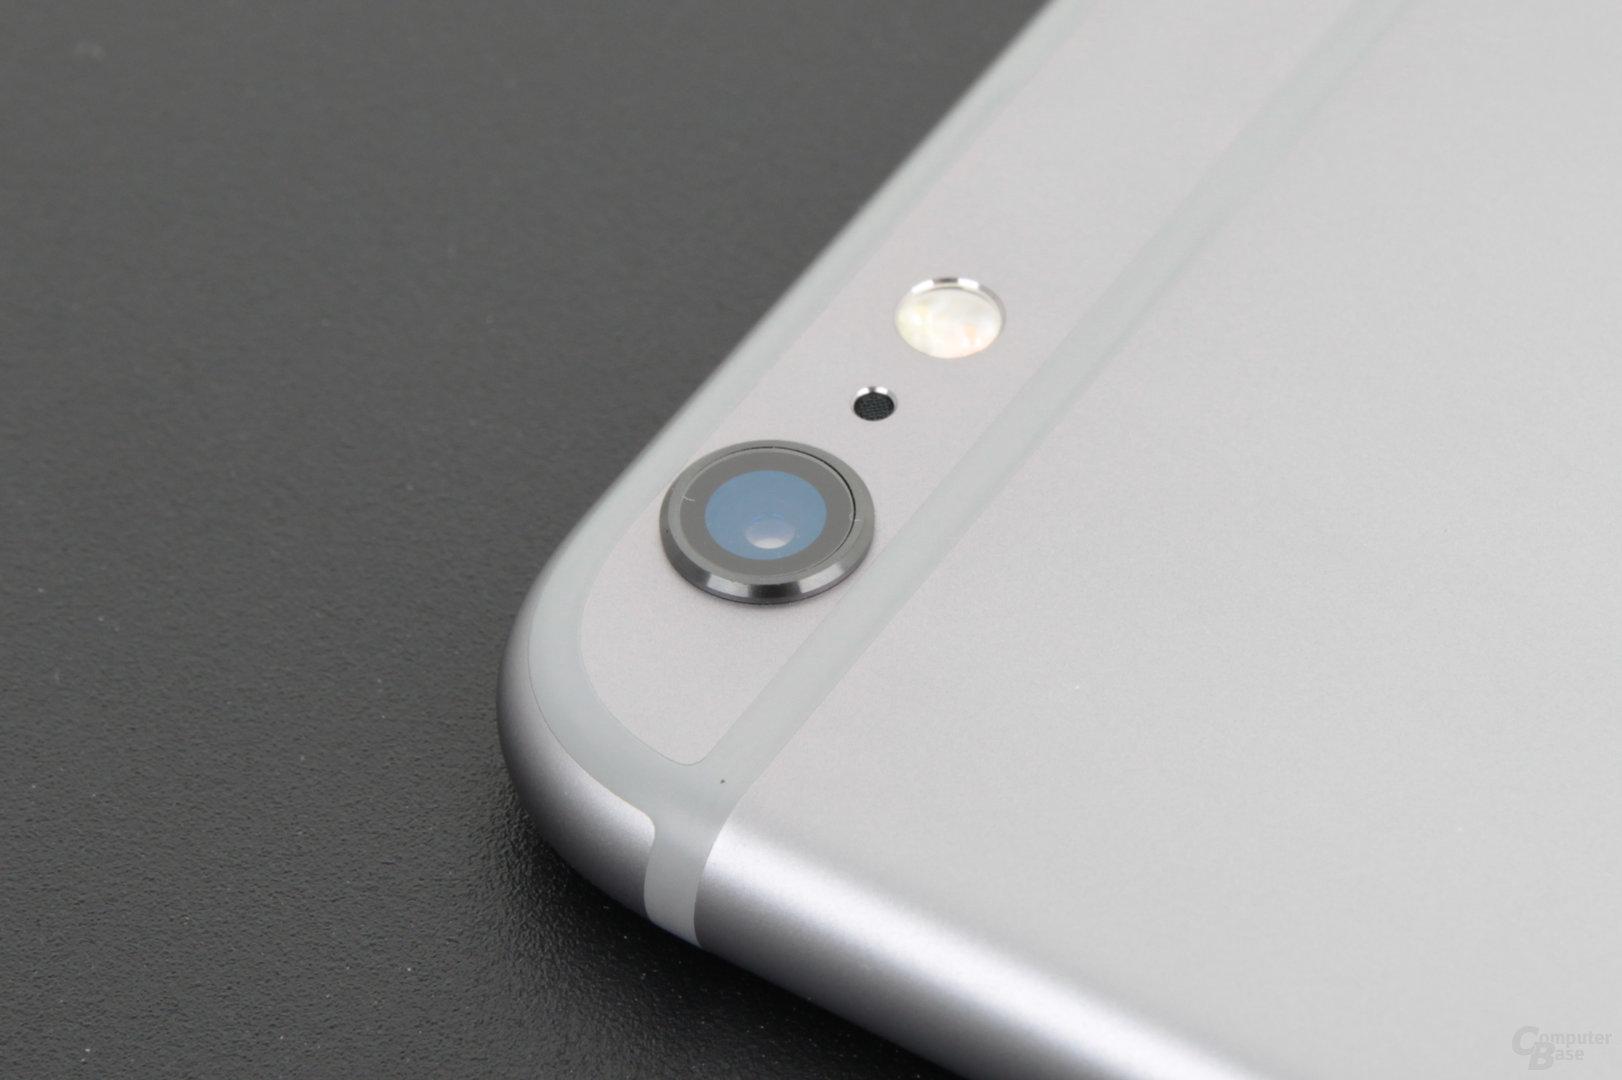 Kamera des iPhone 6s Plus